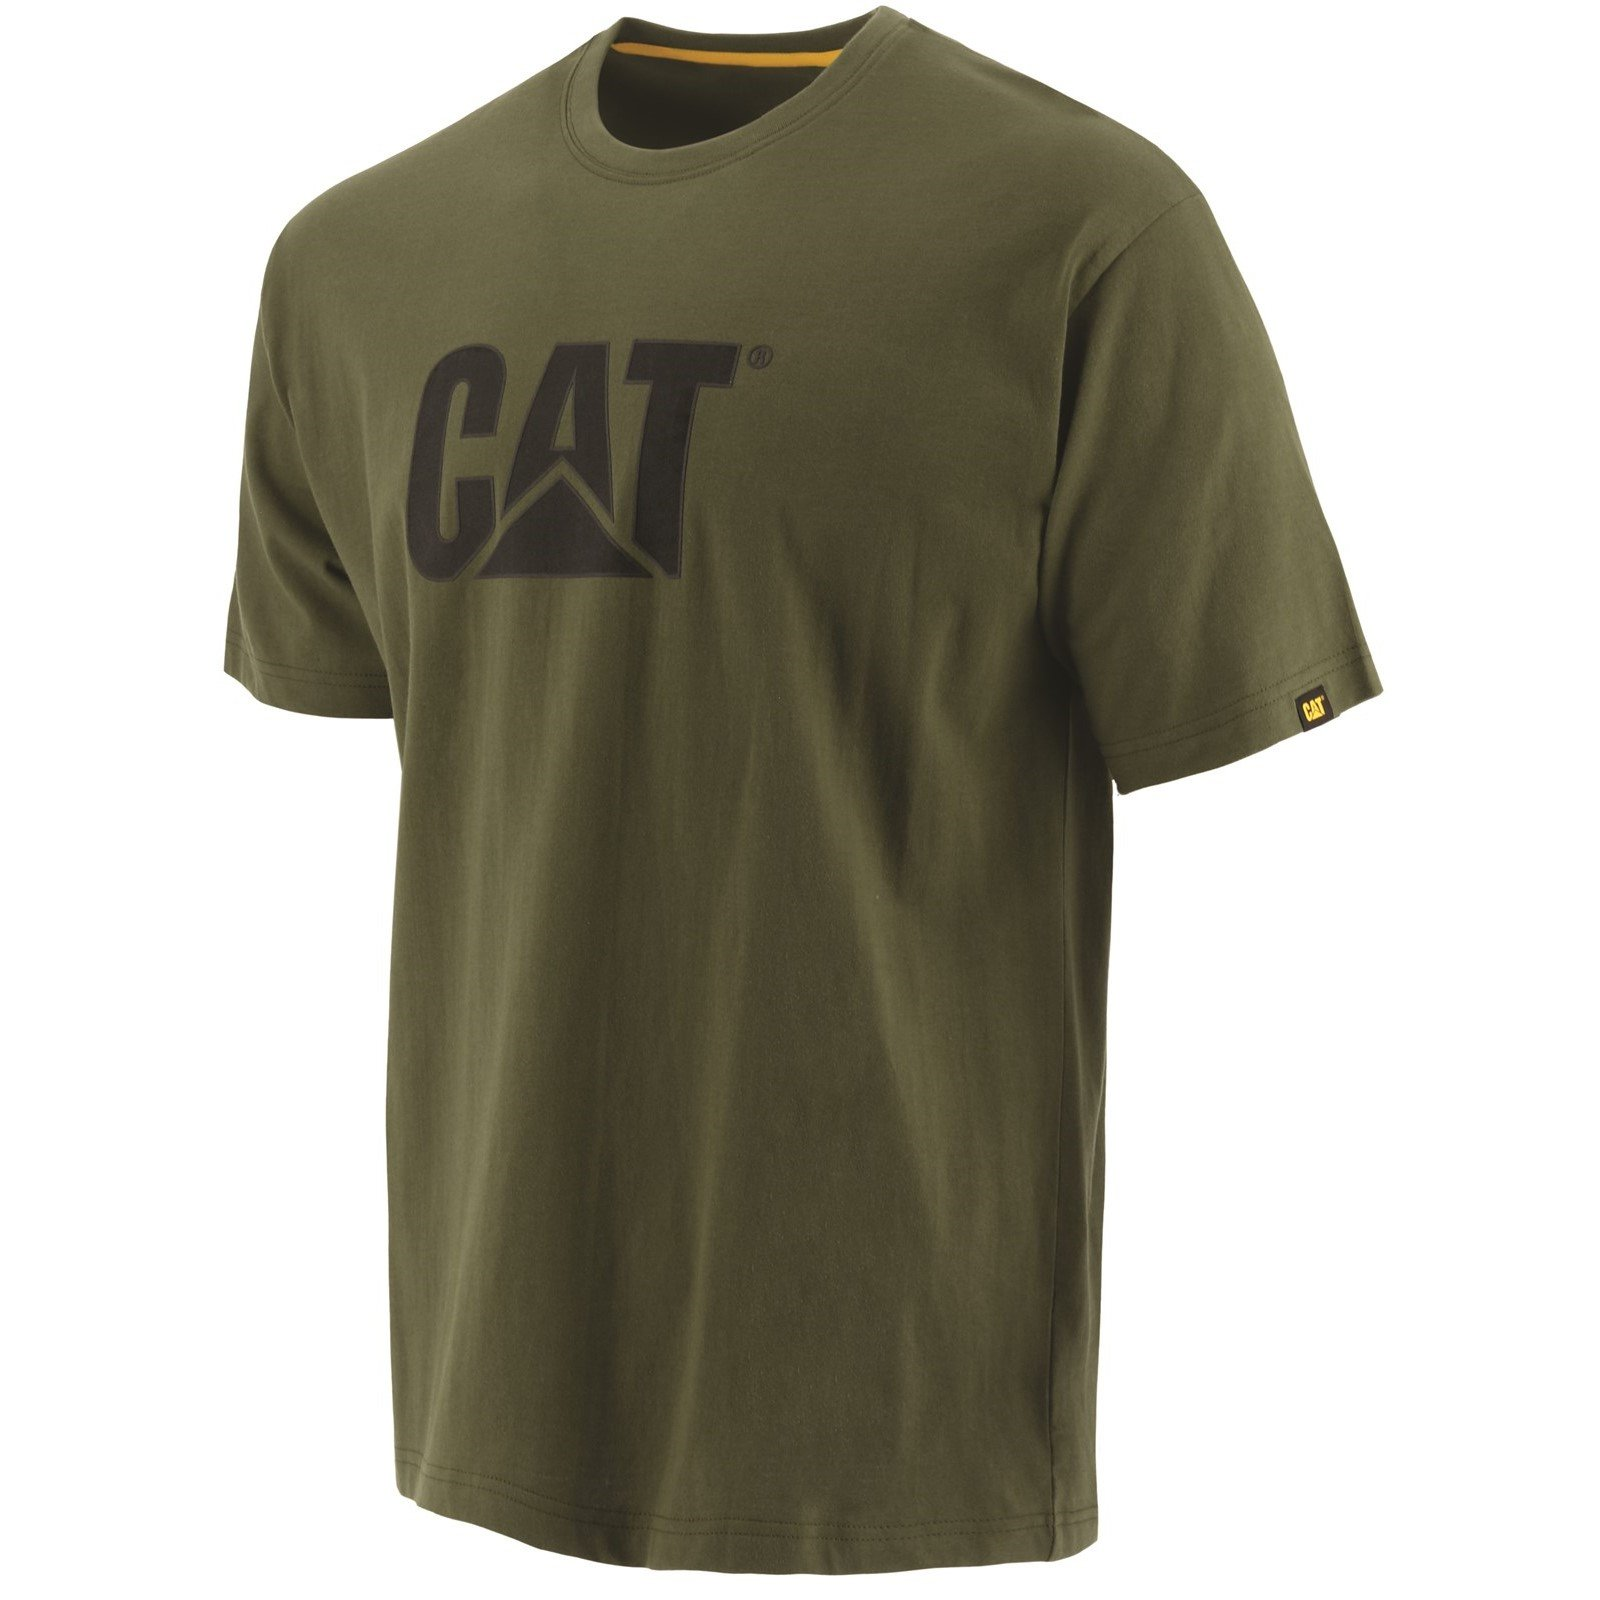 Caterpillar Men's Trademark Logo T-Shirt Various Colours 25301-42086 - Chive 4X